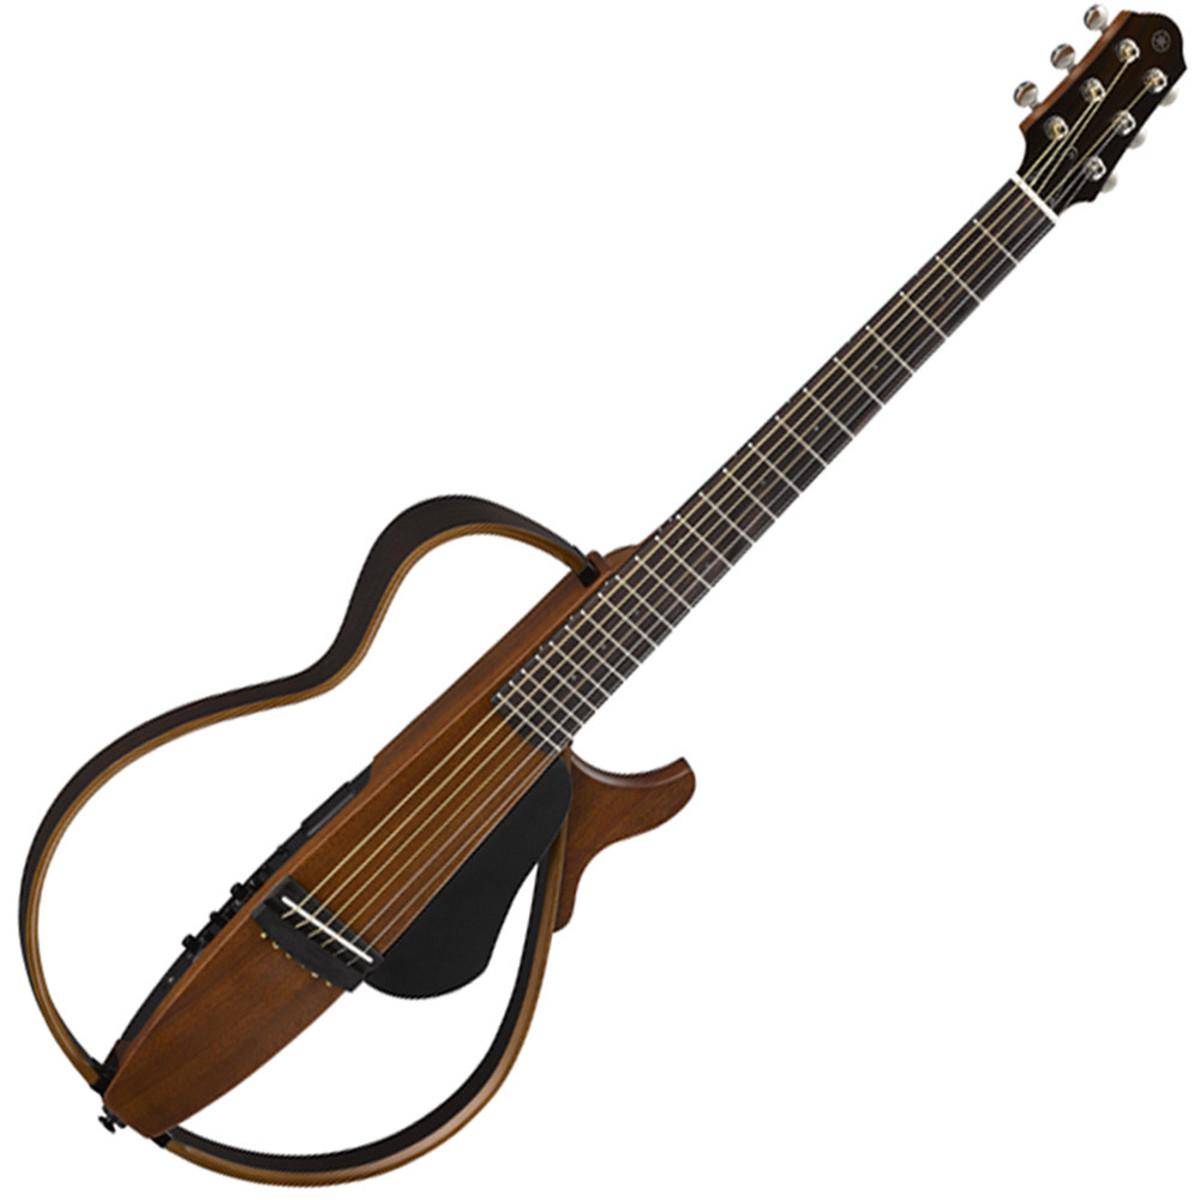 Yamaha Silent Guitar Slg200s : yamaha slg200s steel string silent guitar natural b stock at gear4music ~ Vivirlamusica.com Haus und Dekorationen